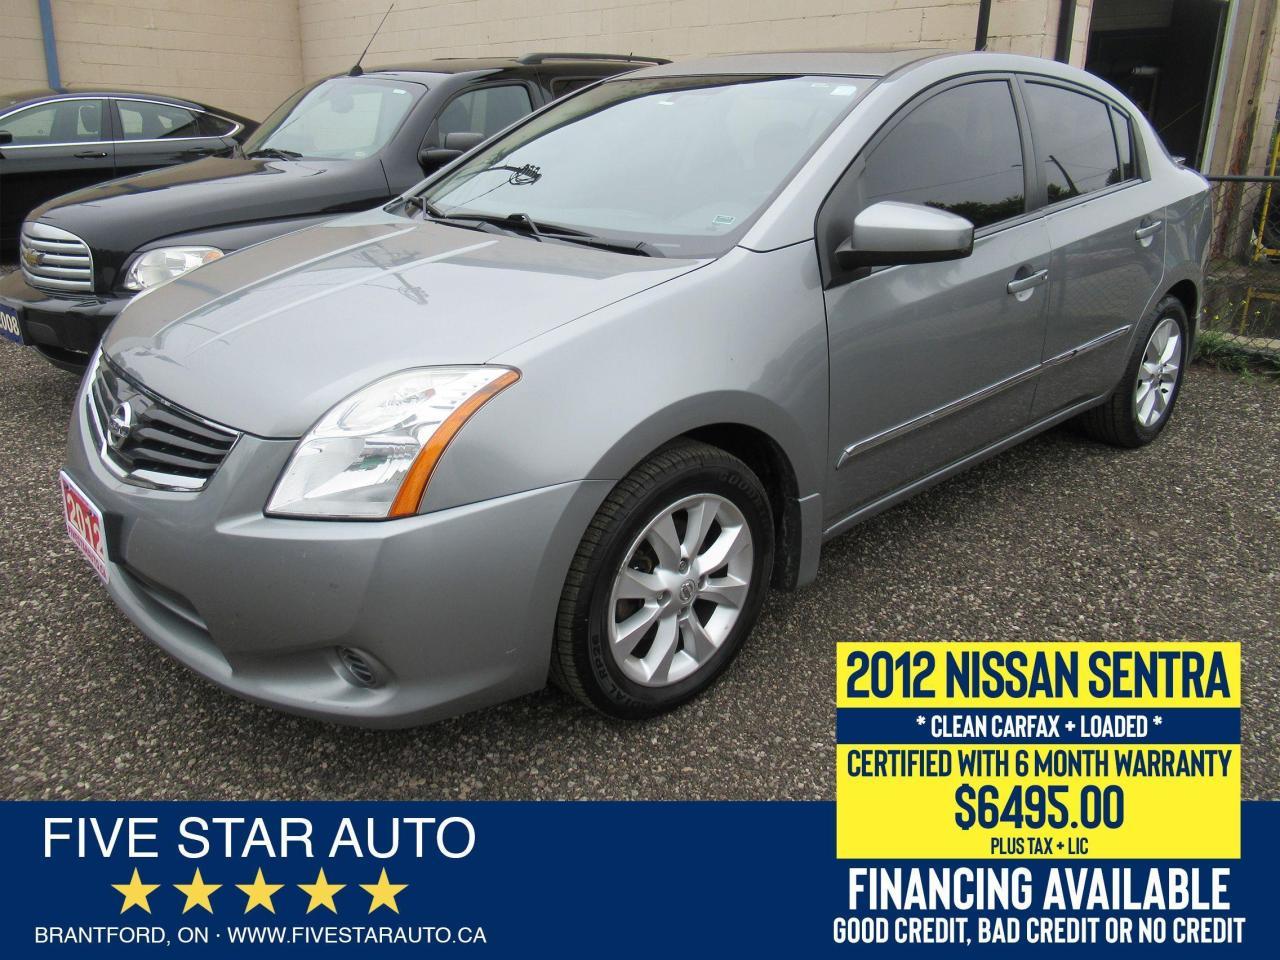 2012 Nissan Sentra 2.0 SL *Clean Carfax* Certified + 6 Month Warranty